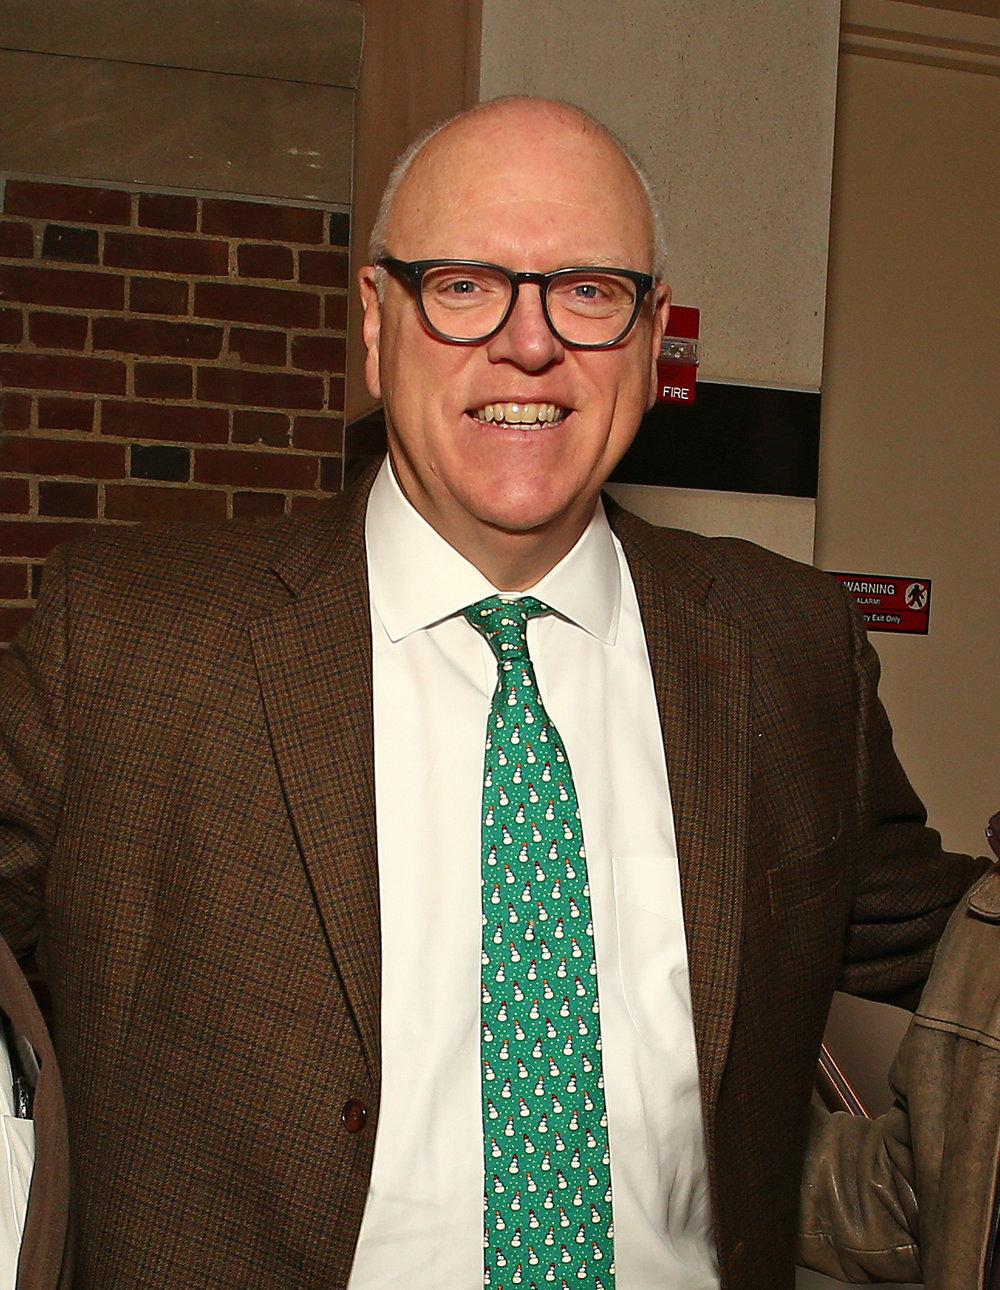 Queens County Democratic Party chair Joe Crowley. Eagle photo by Andy Katz